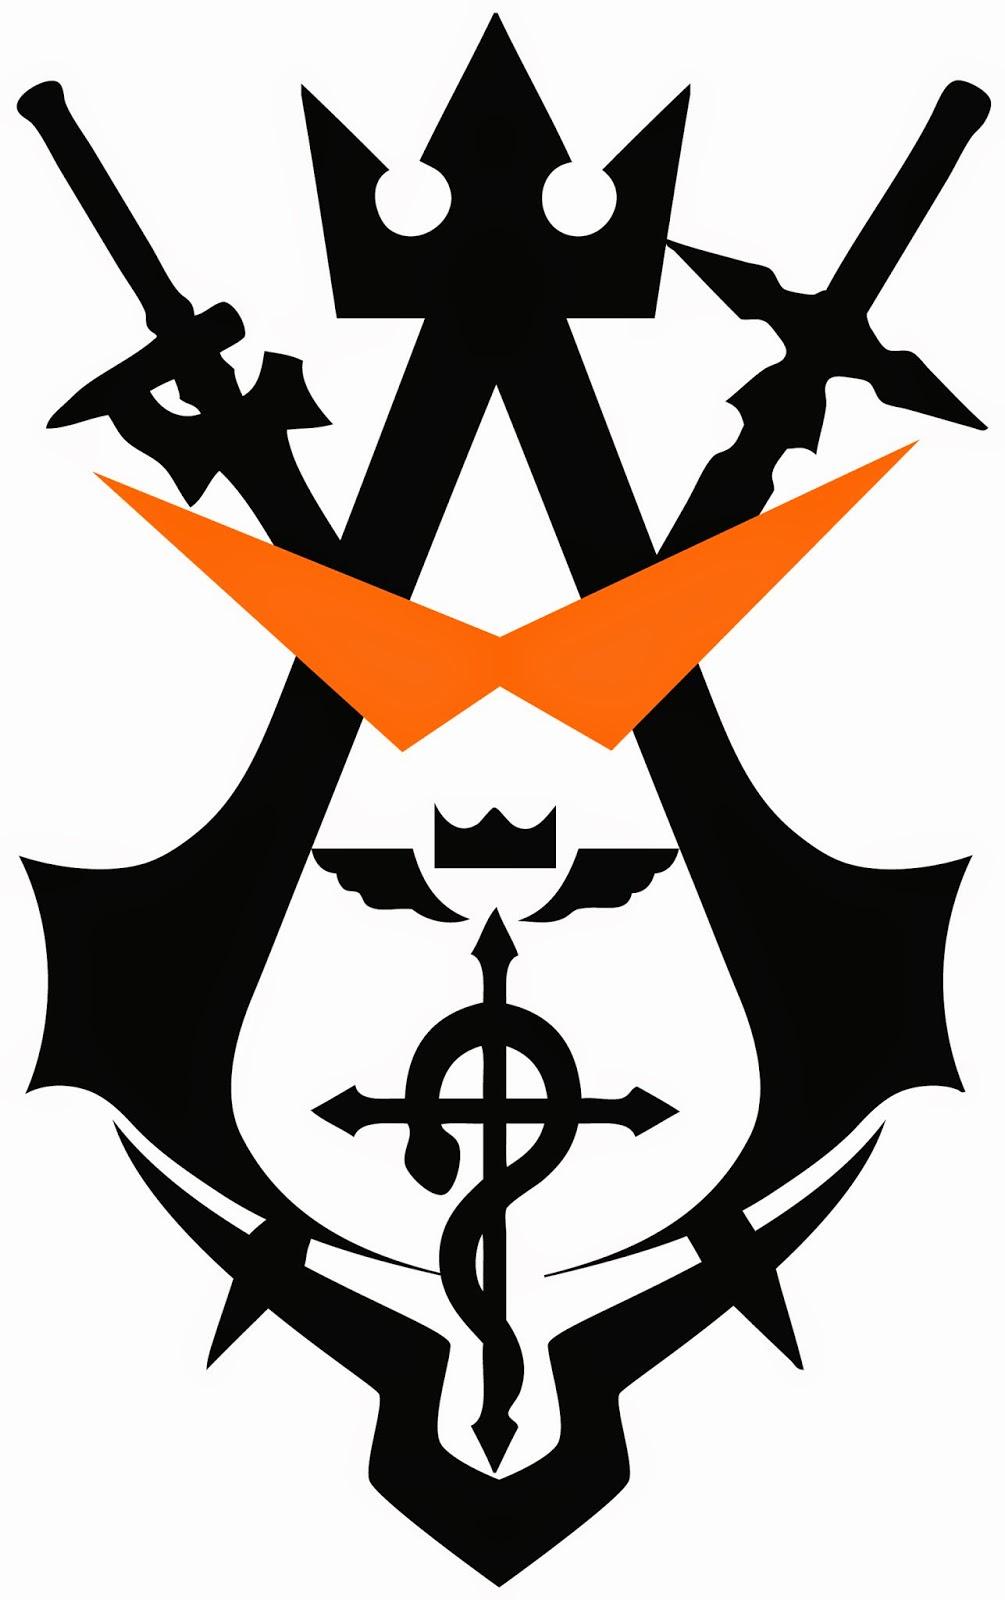 Artistic influences june 2014 used animegames kingdom hearts assassins creed code geass fullmetal alchemist sword art online and gurren lagann biocorpaavc